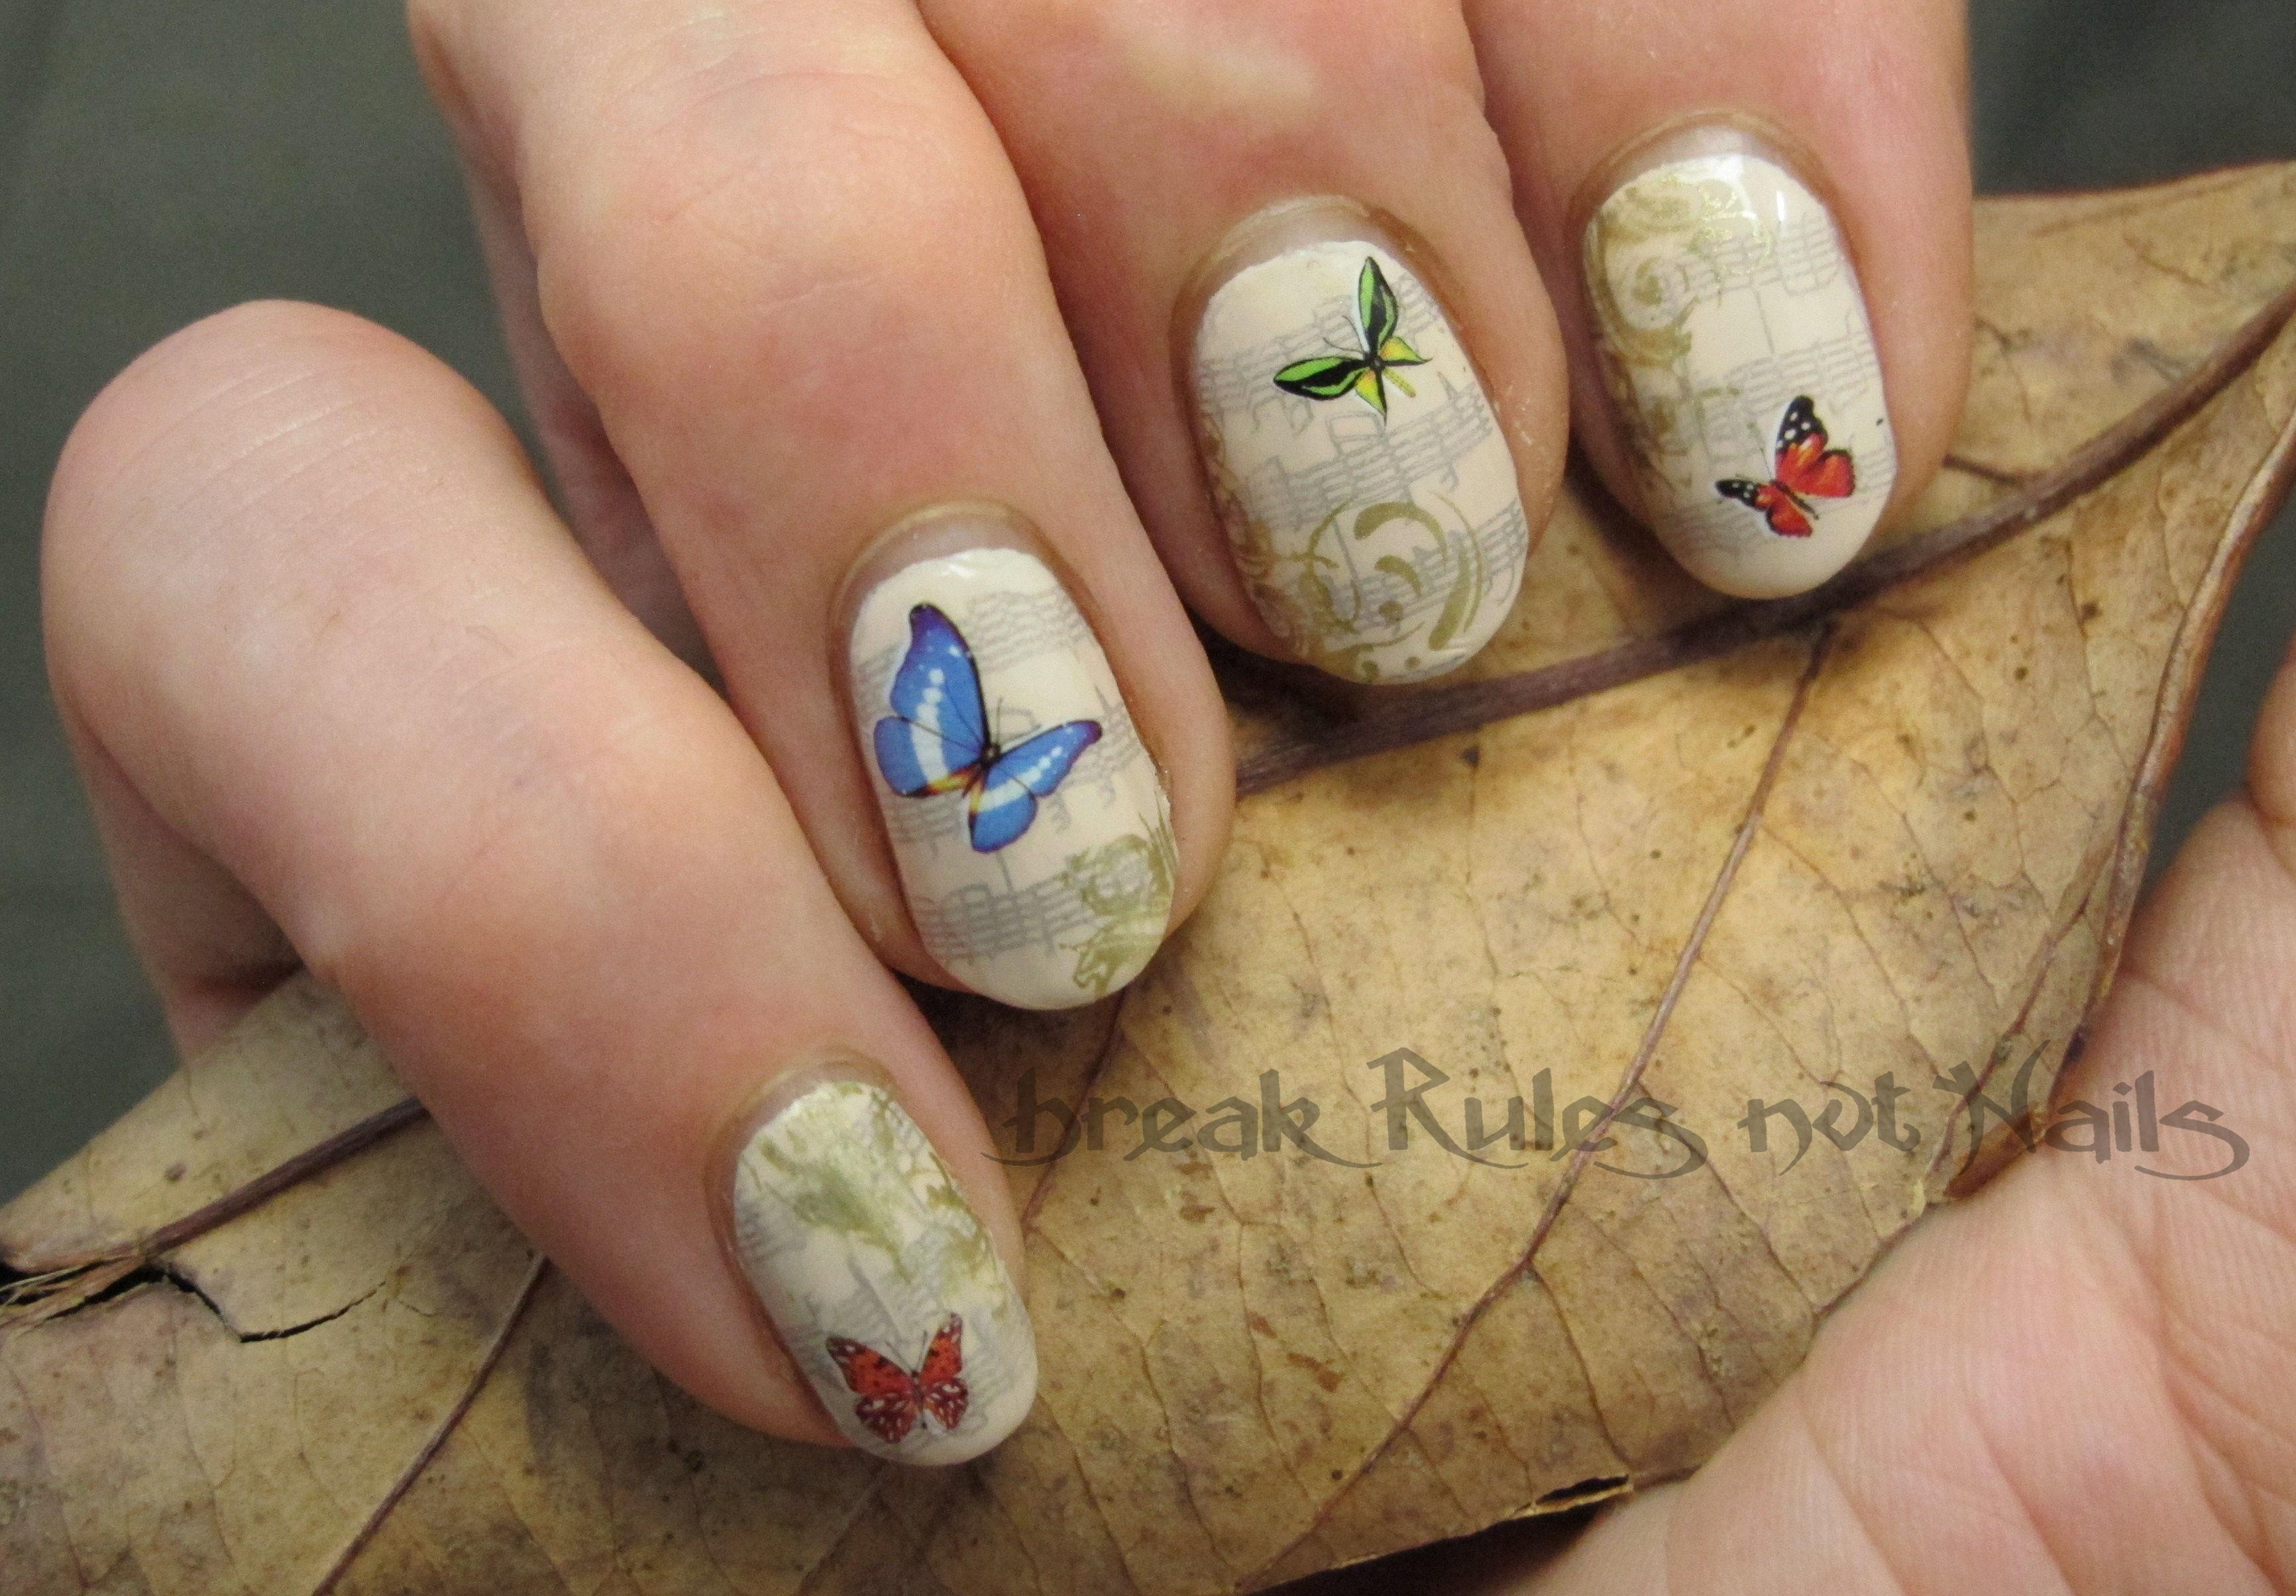 Enchanted Walk Inspired Nail Art Break Rules Not Nails